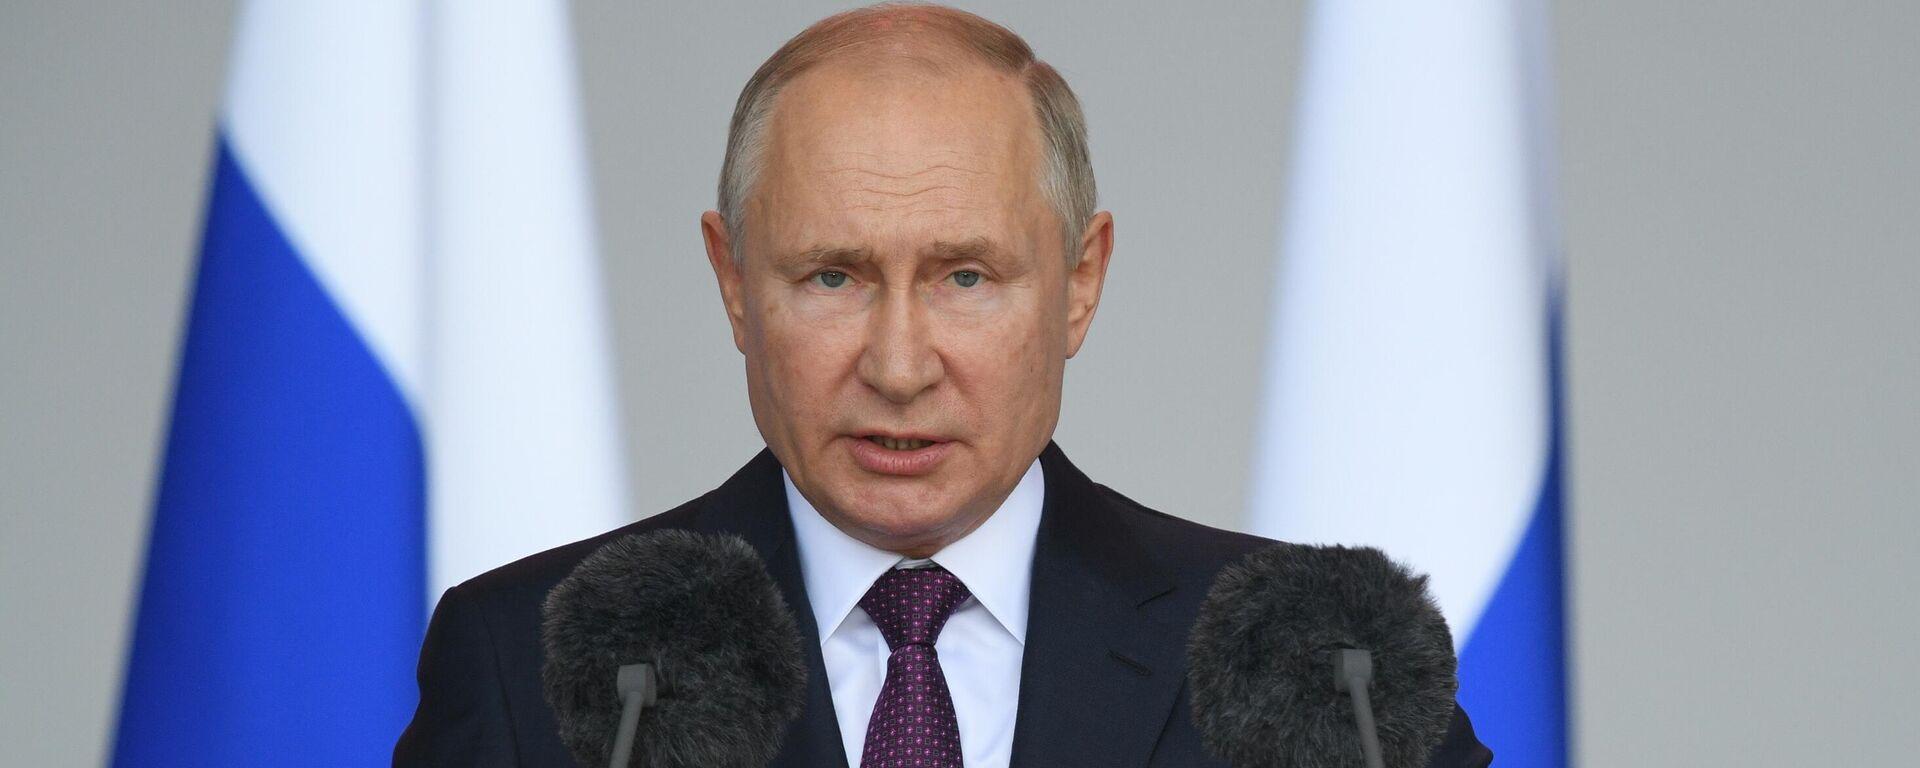 Президент РФ Владимир Путин - Sputnik Тоҷикистон, 1920, 17.09.2021